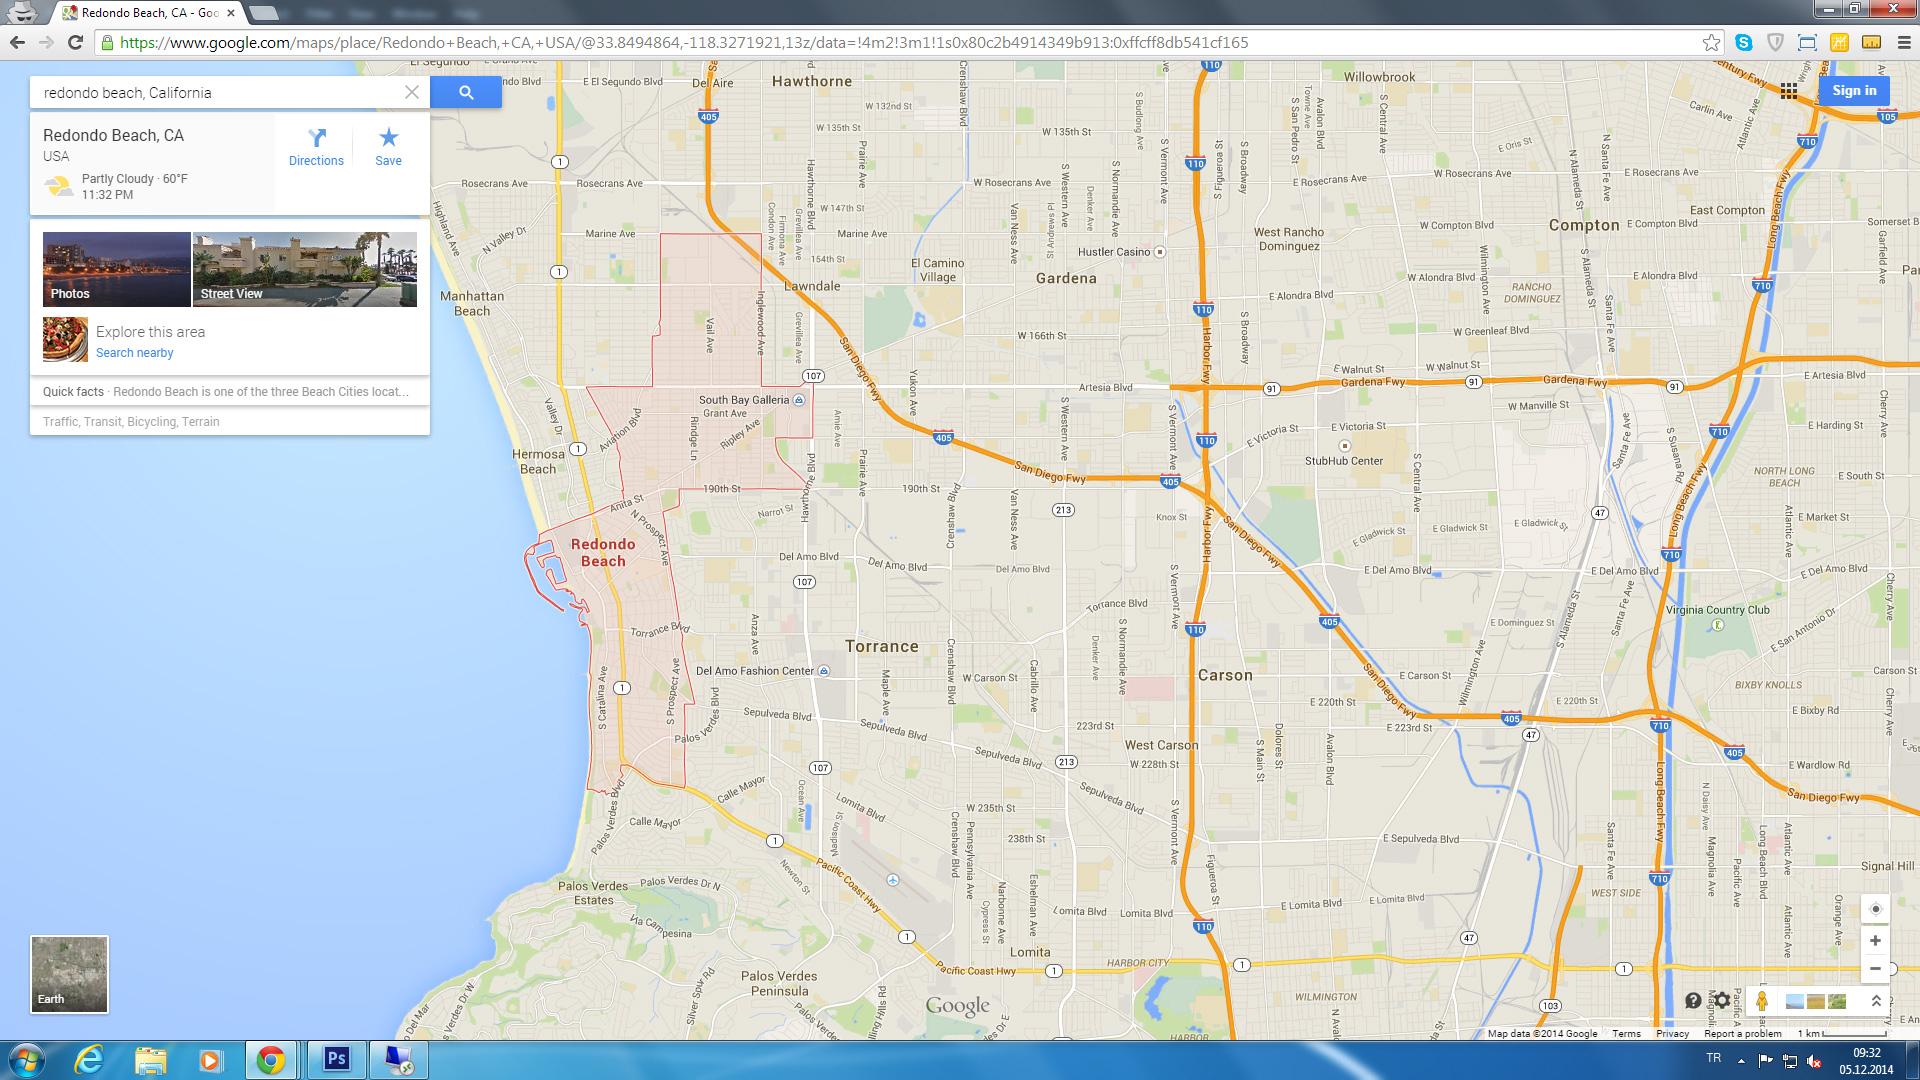 Redondo Beach California Map - Klipy - Redondo Beach California Map